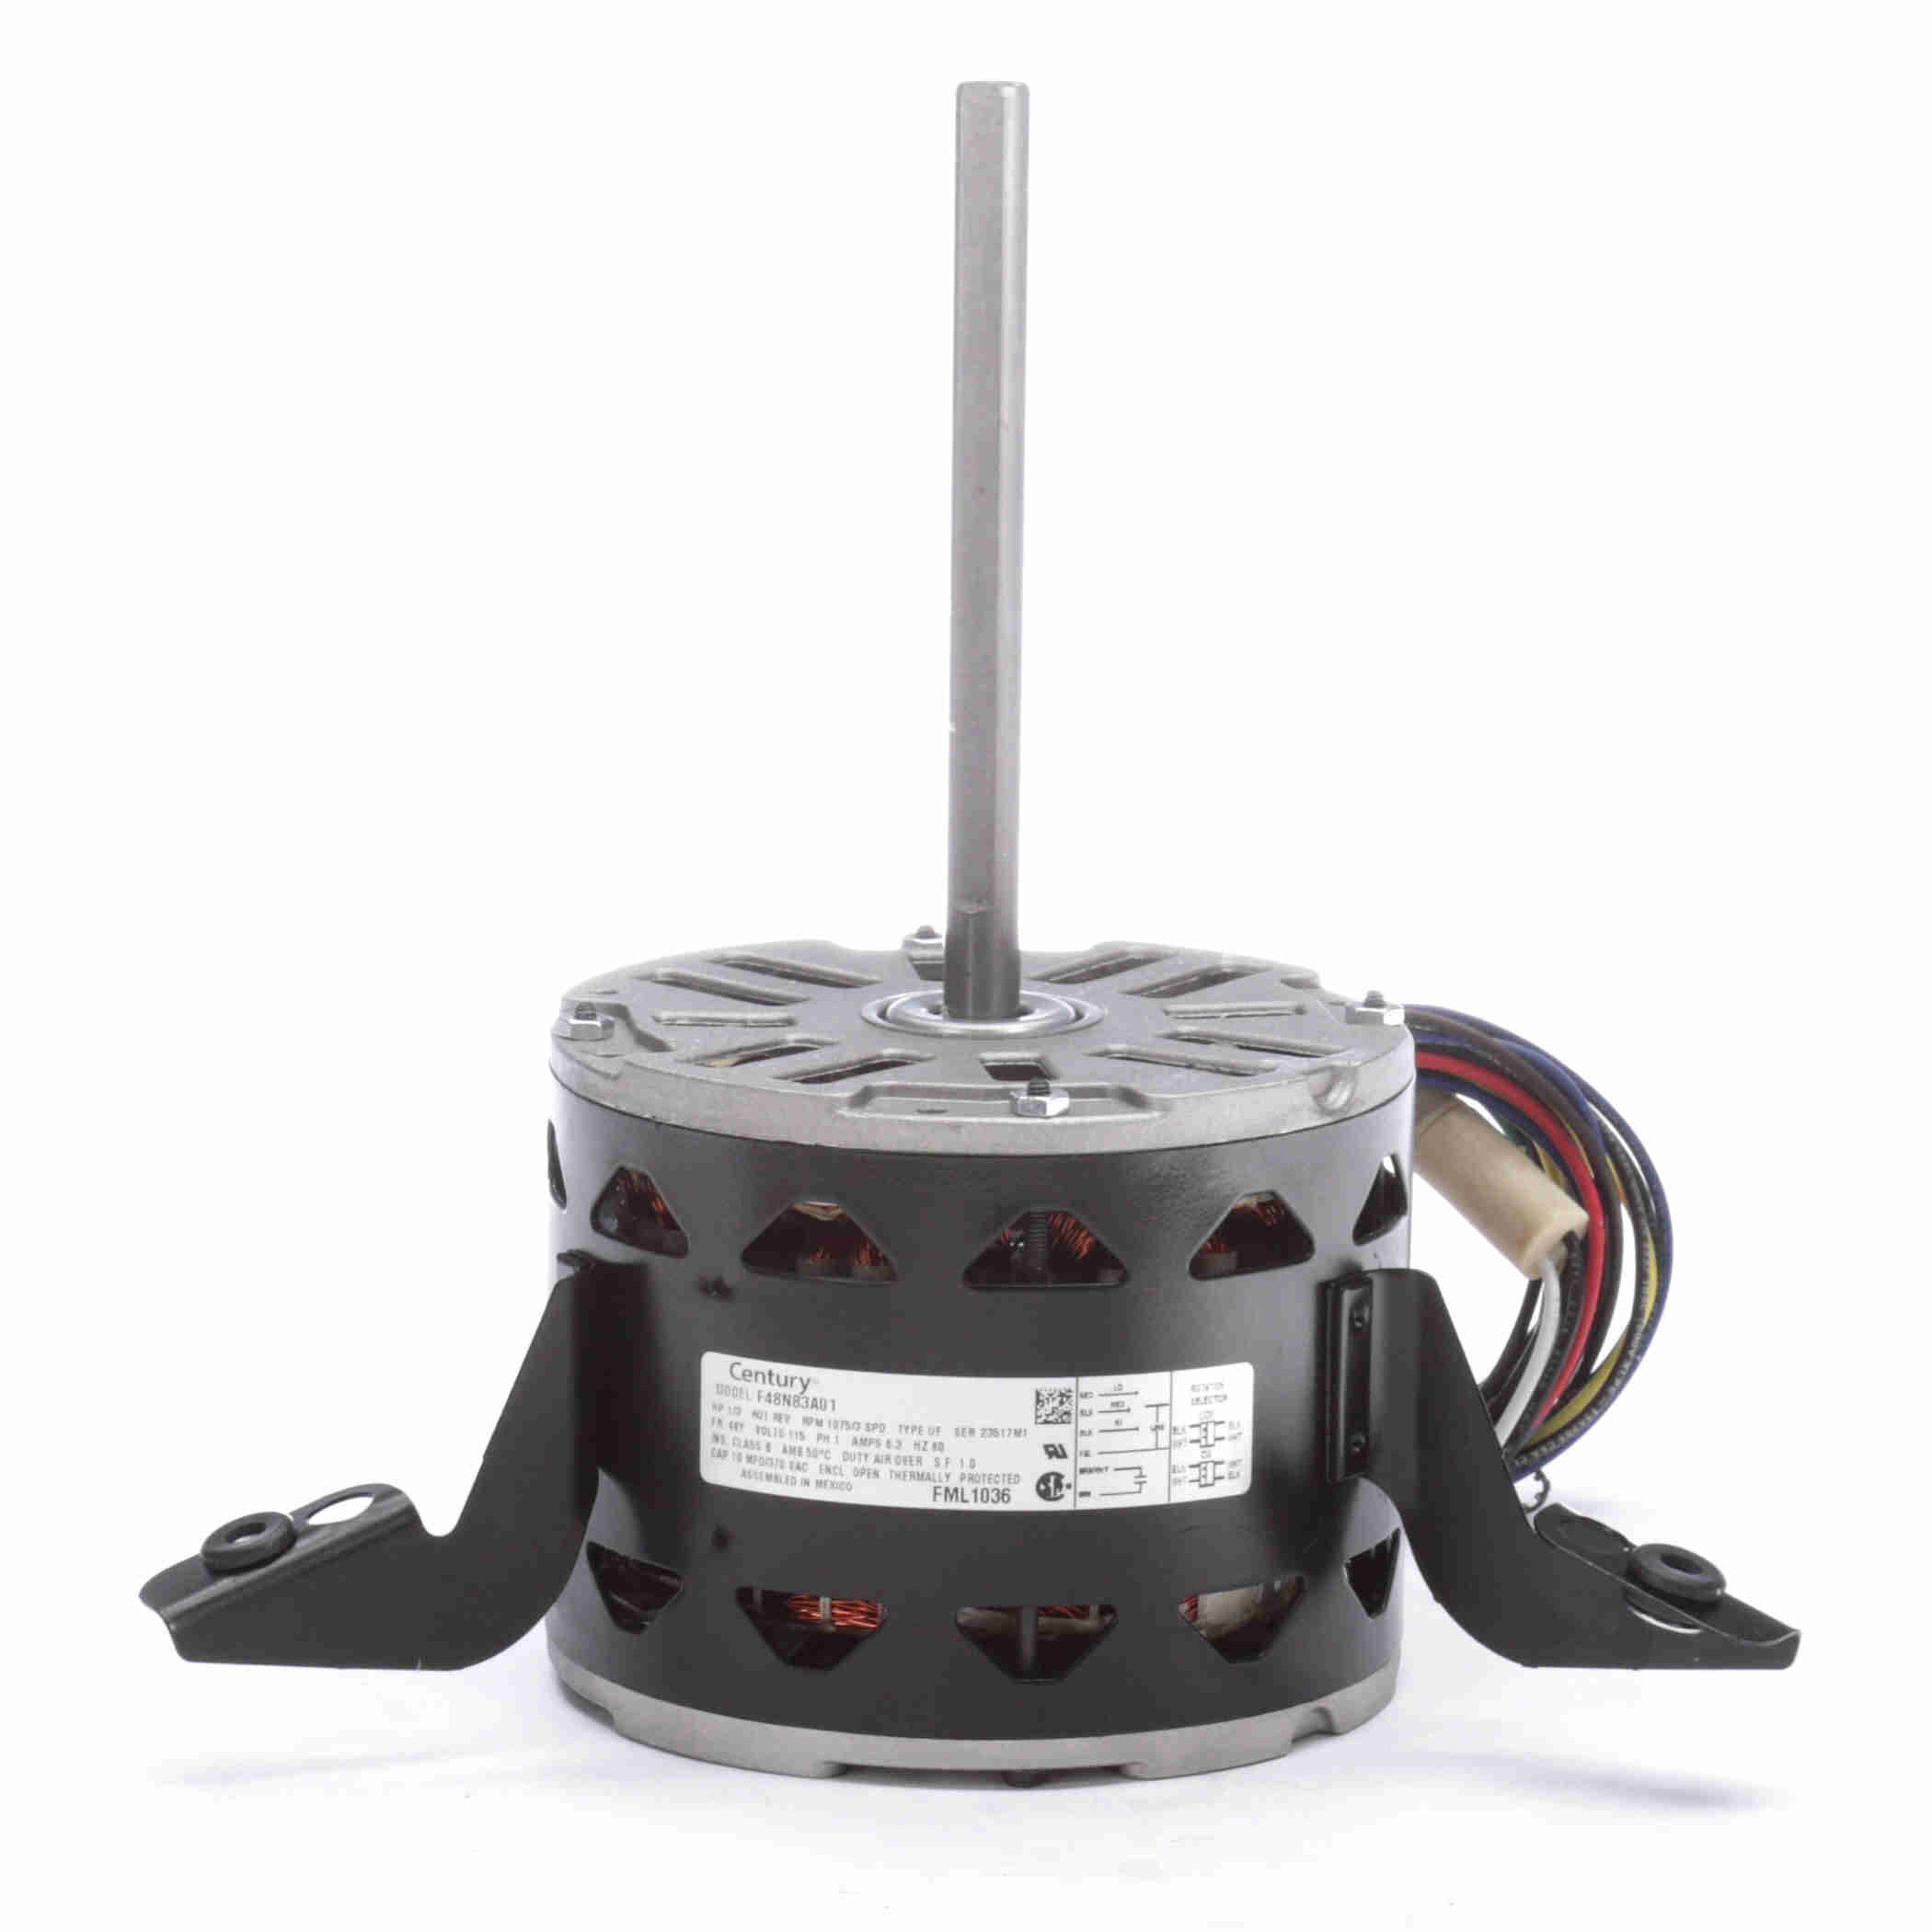 fml1036 century 1 3hp electric motor 1075 rpm. Black Bedroom Furniture Sets. Home Design Ideas